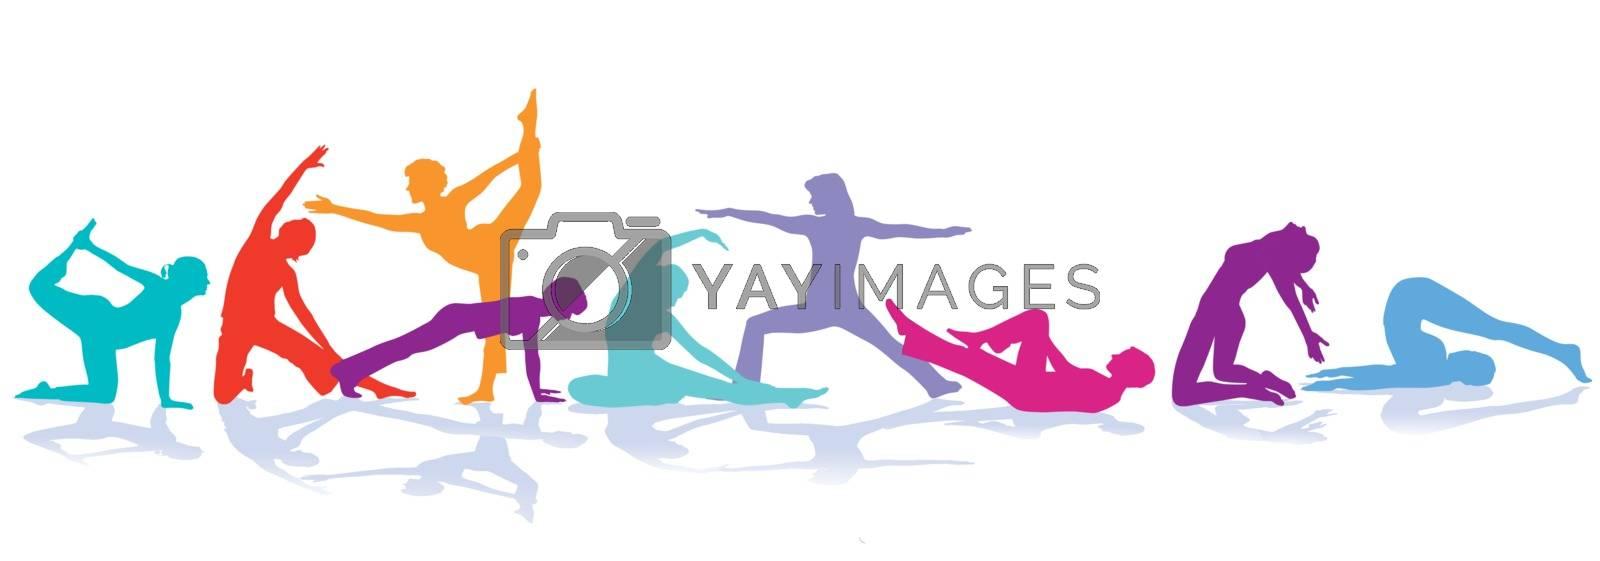 Gymnastics figures, sport illustration